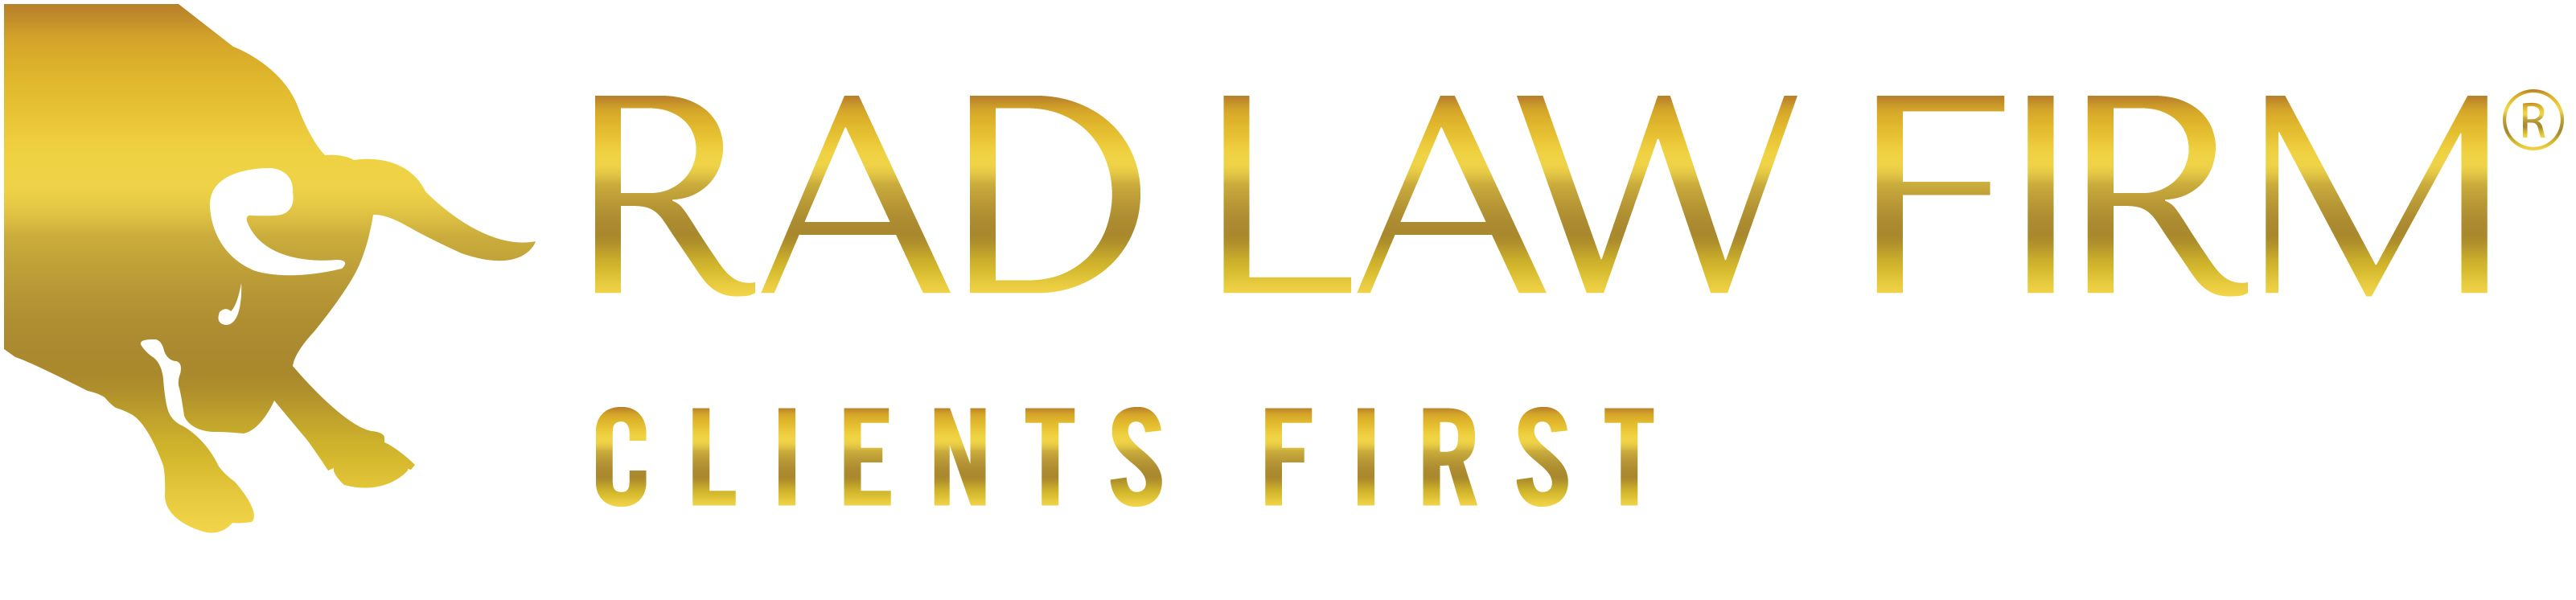 Rad Law Firm law firm logo